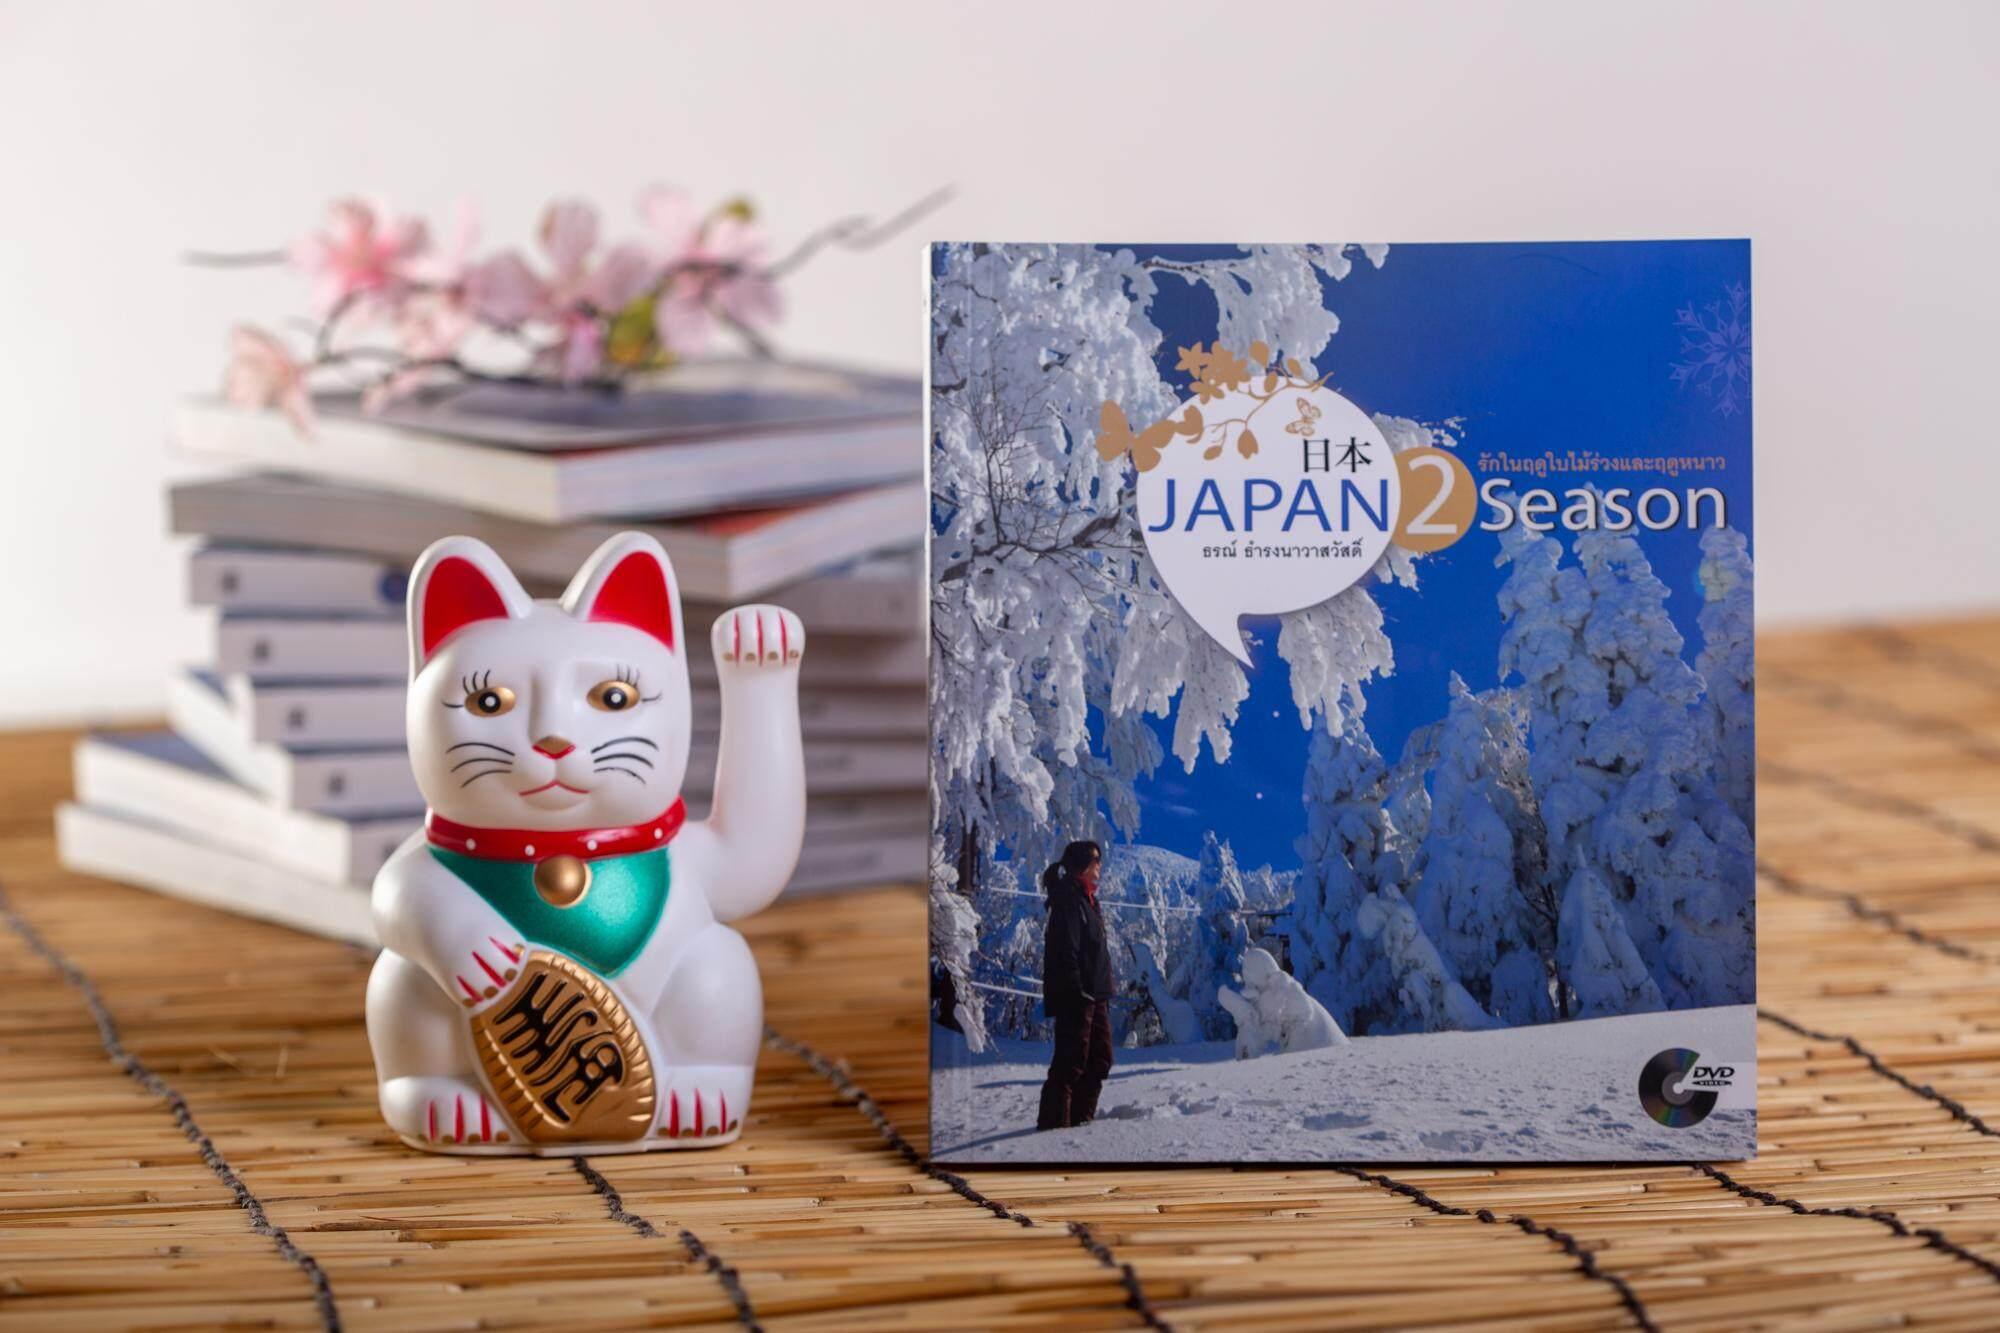 Japan 2 Season (แถม Dvd) By Baanphraarthit Publisher.